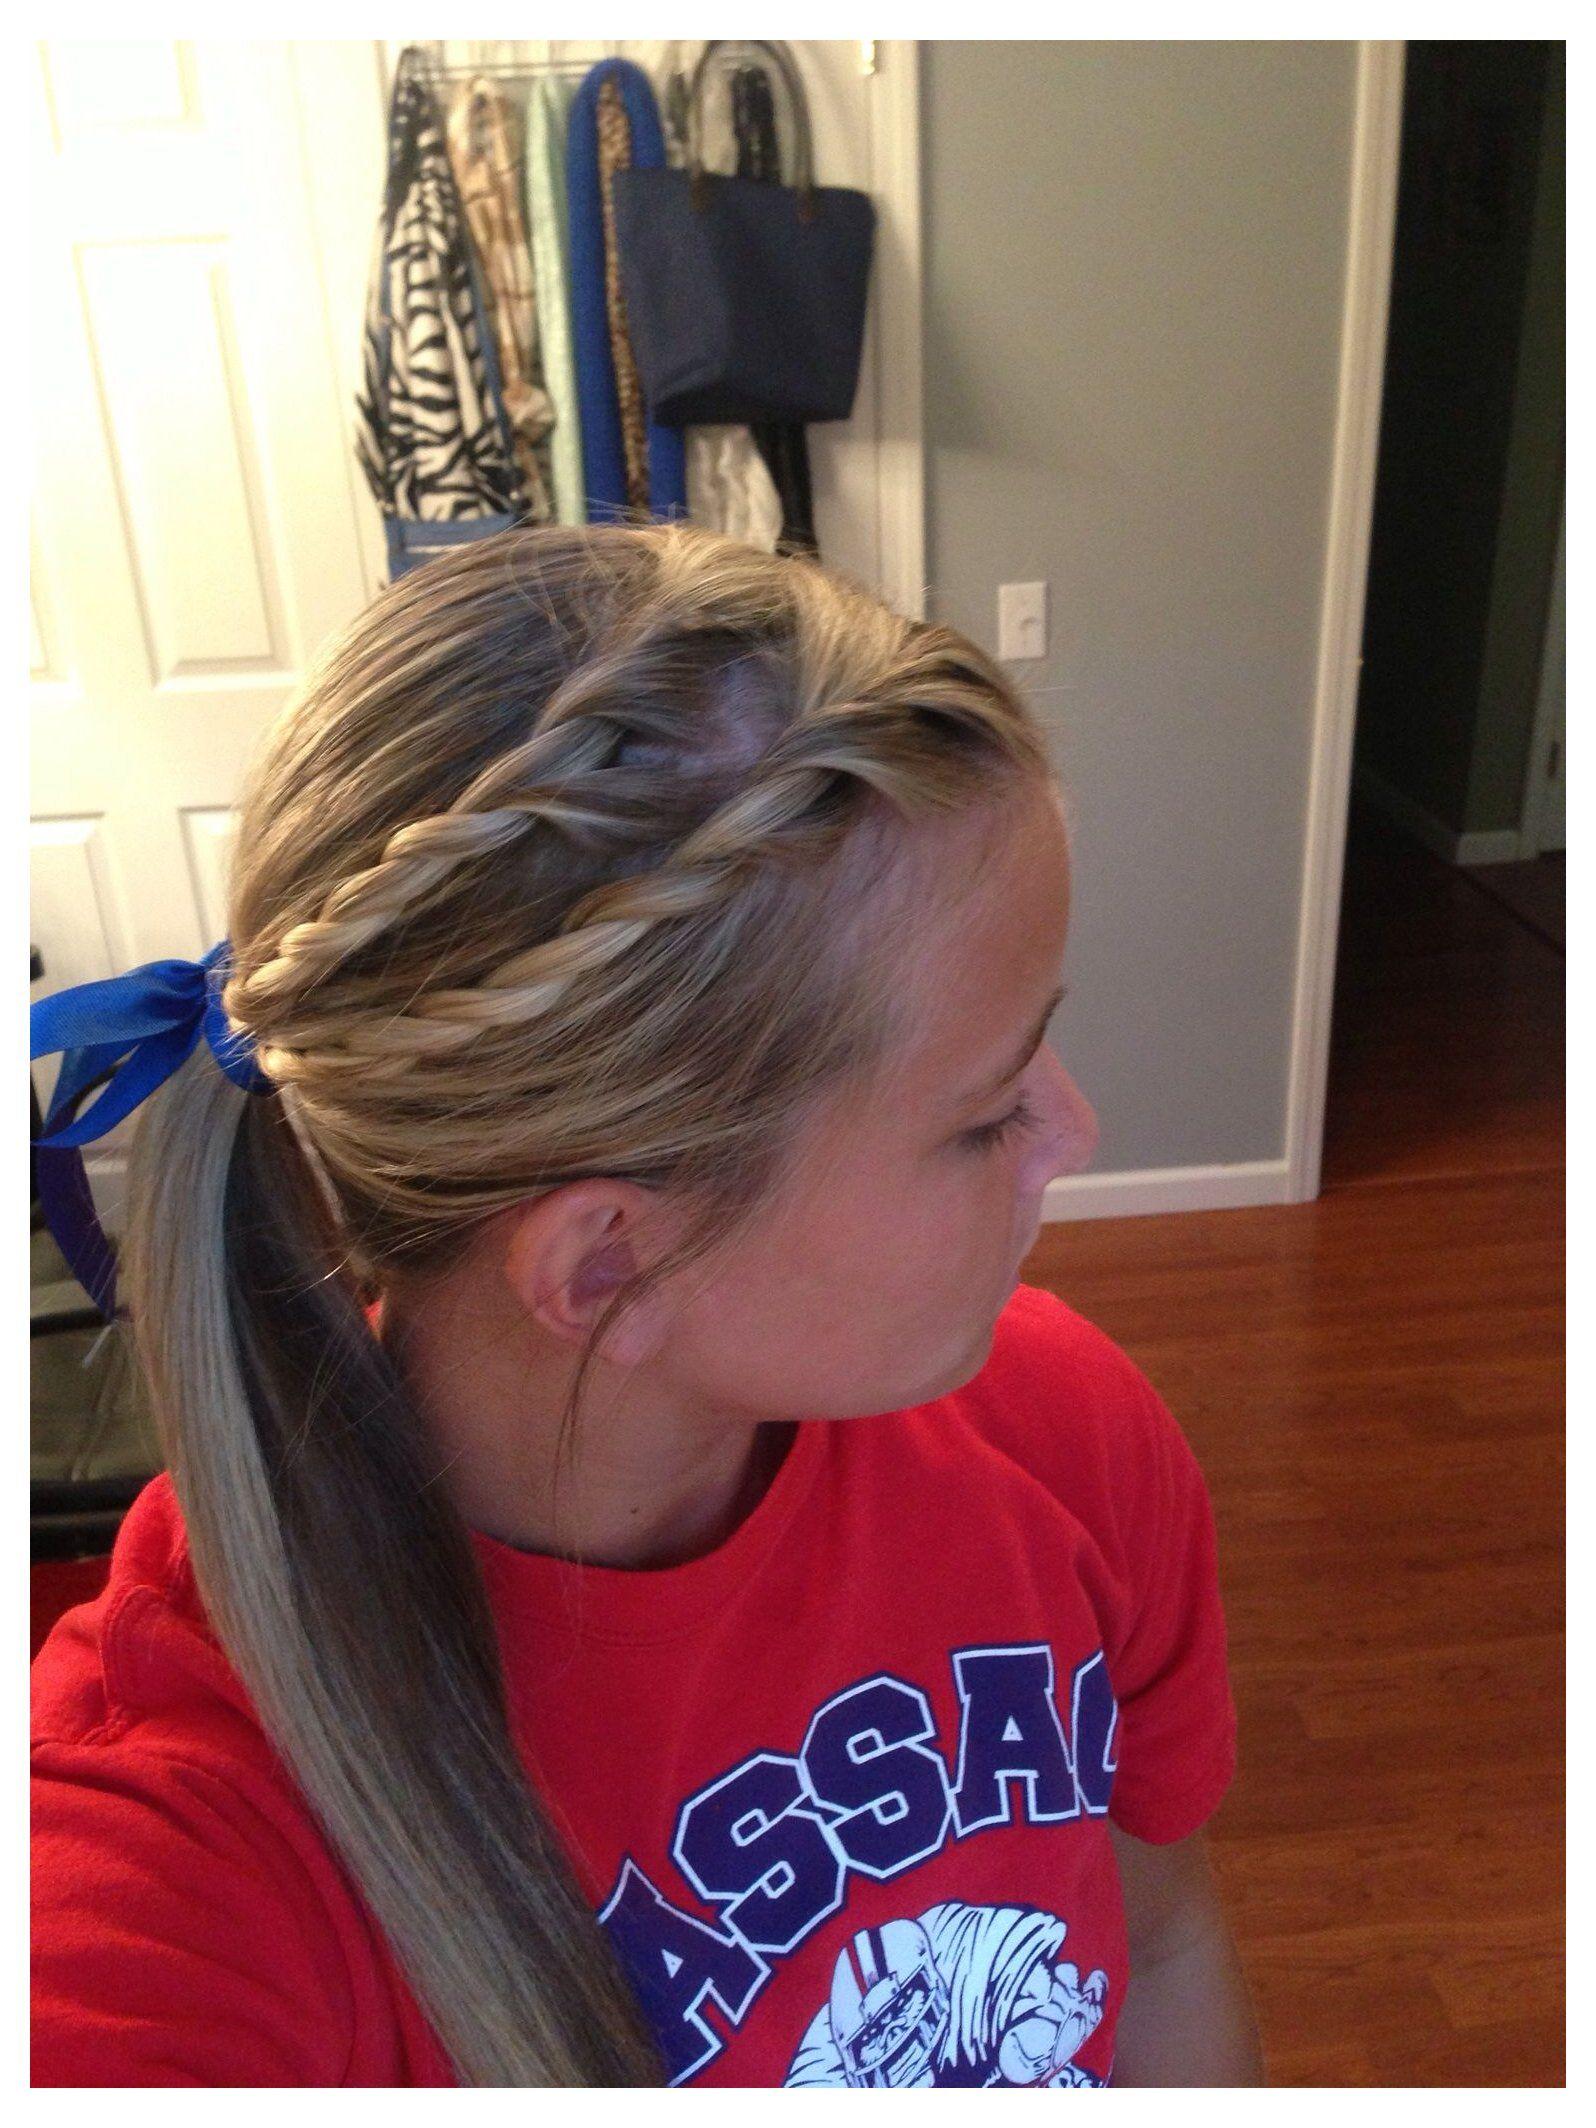 Pin By Brandy Miller On Hair In 2021 Softball Hairstyles Sports Hairstyles Athletic Hairstyles